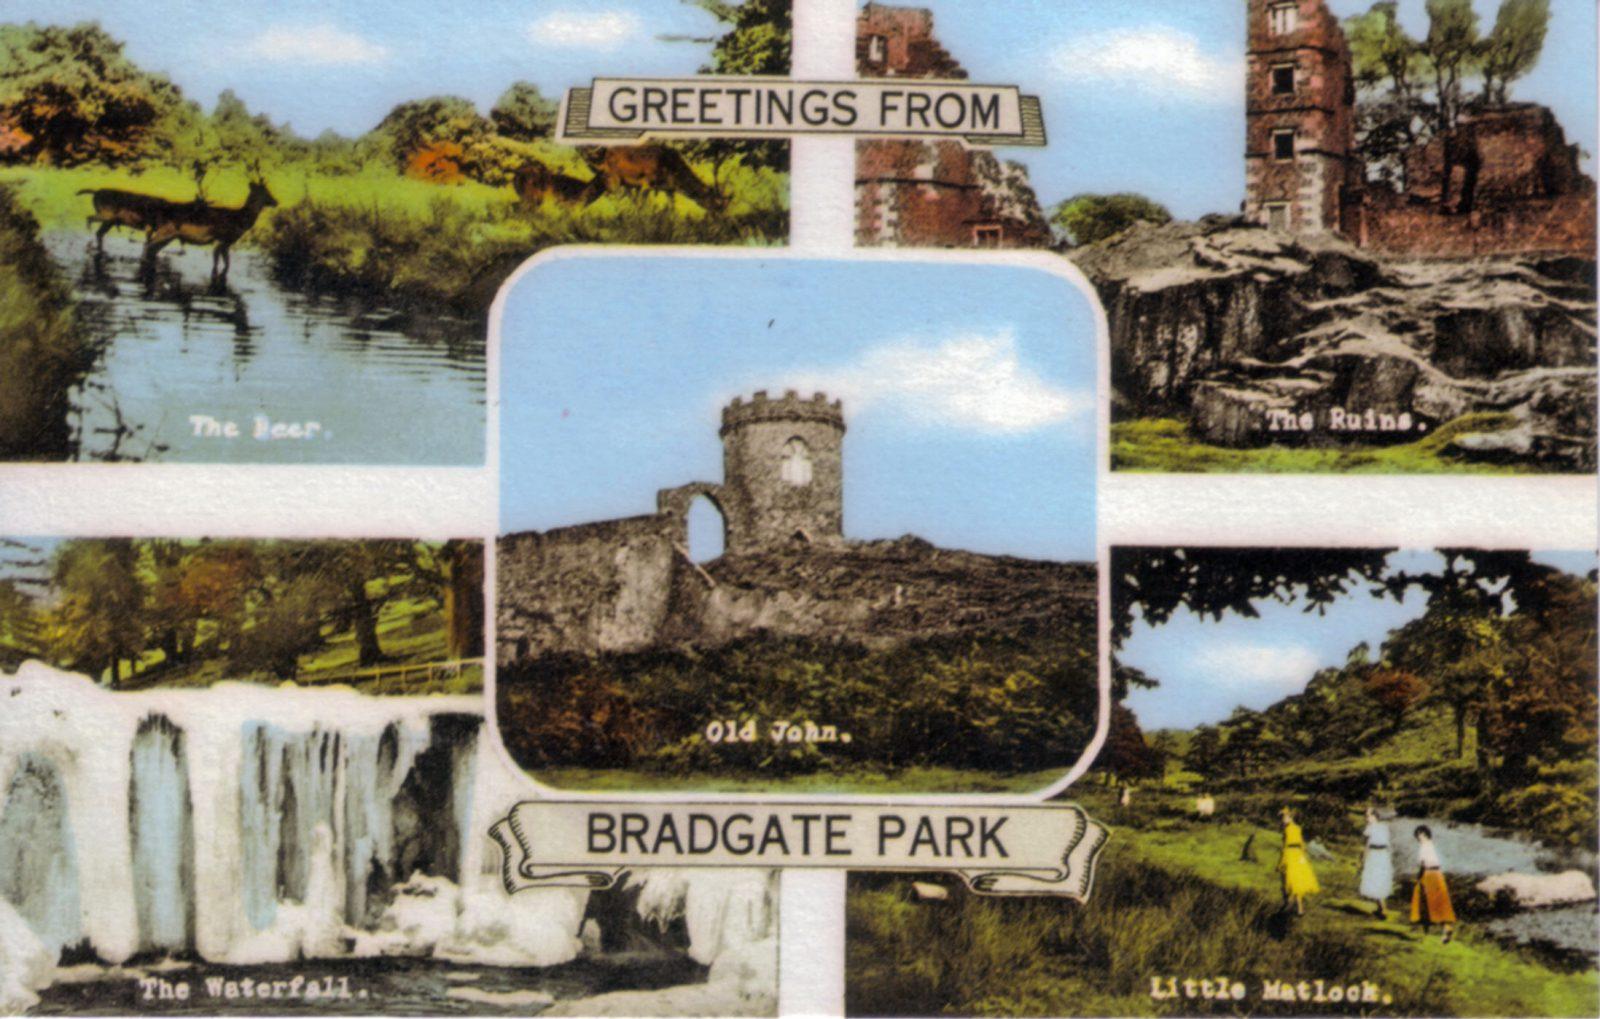 Bradgate Park, Leicester. 1941-1960: General views: river, deer, Old John, Ruins, Waterfall, Little Matlock. (File:1132)